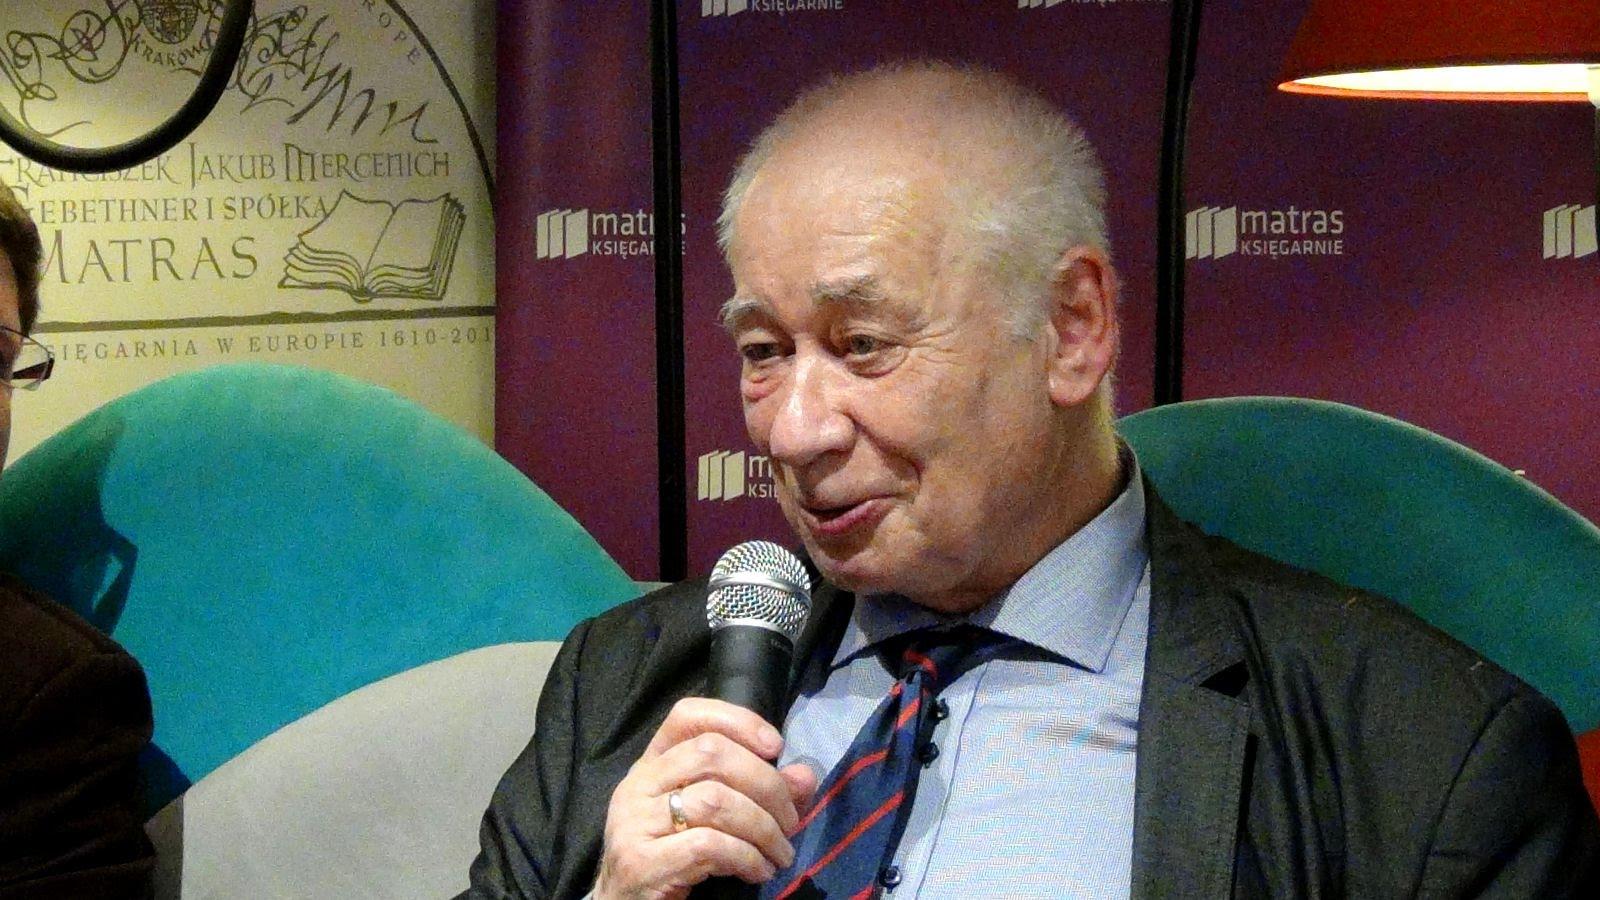 Jan Woleński